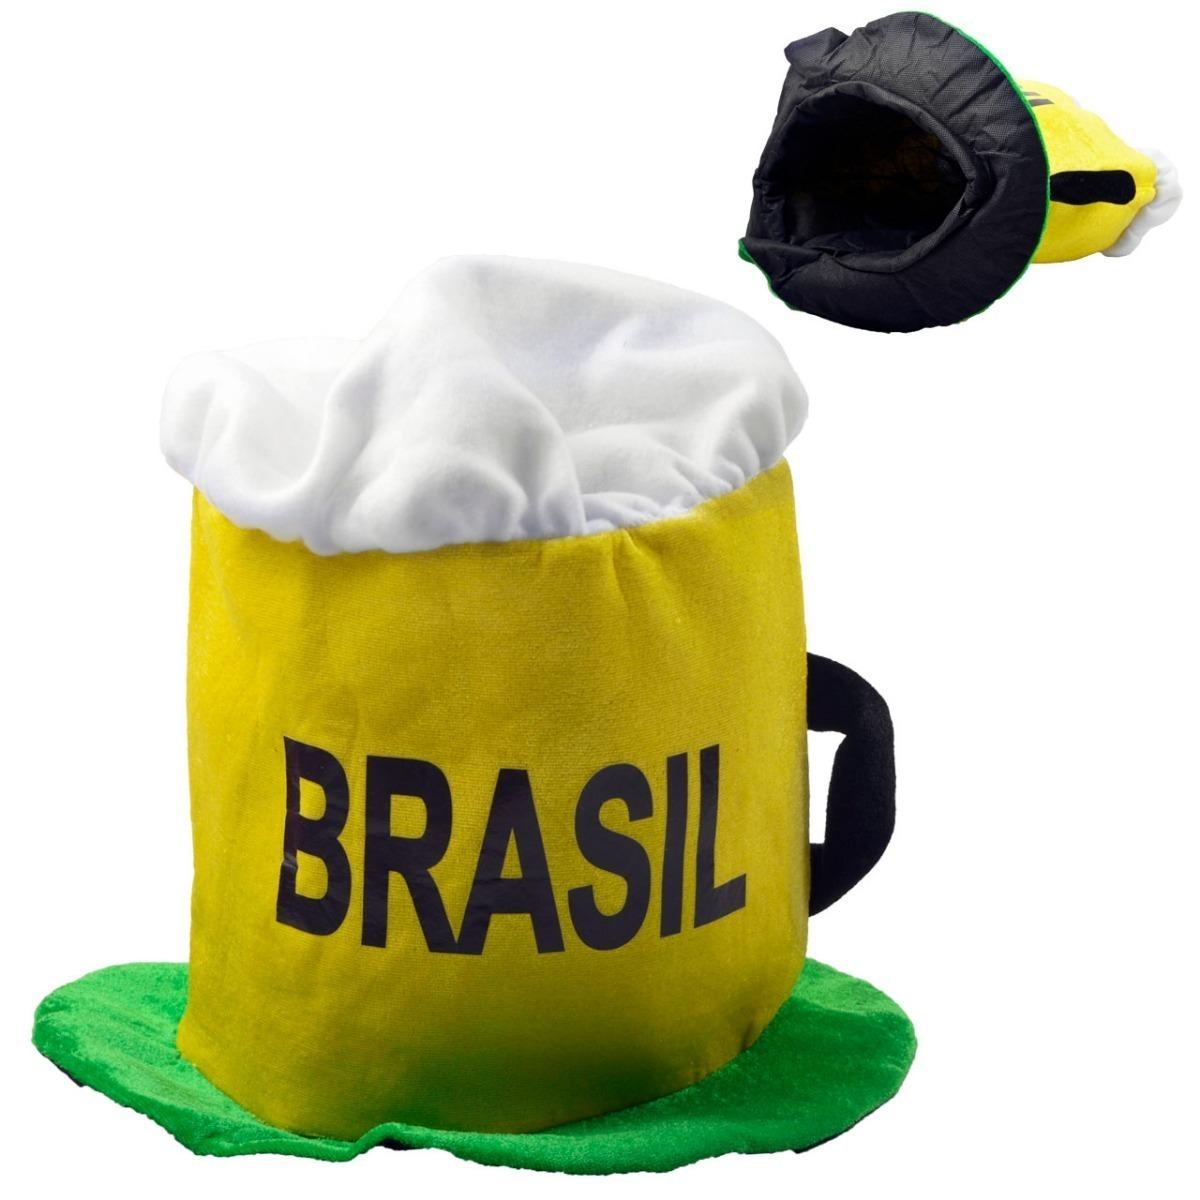 gorro brasil copa do mundo fantasia festas carnaval r 20 00 em